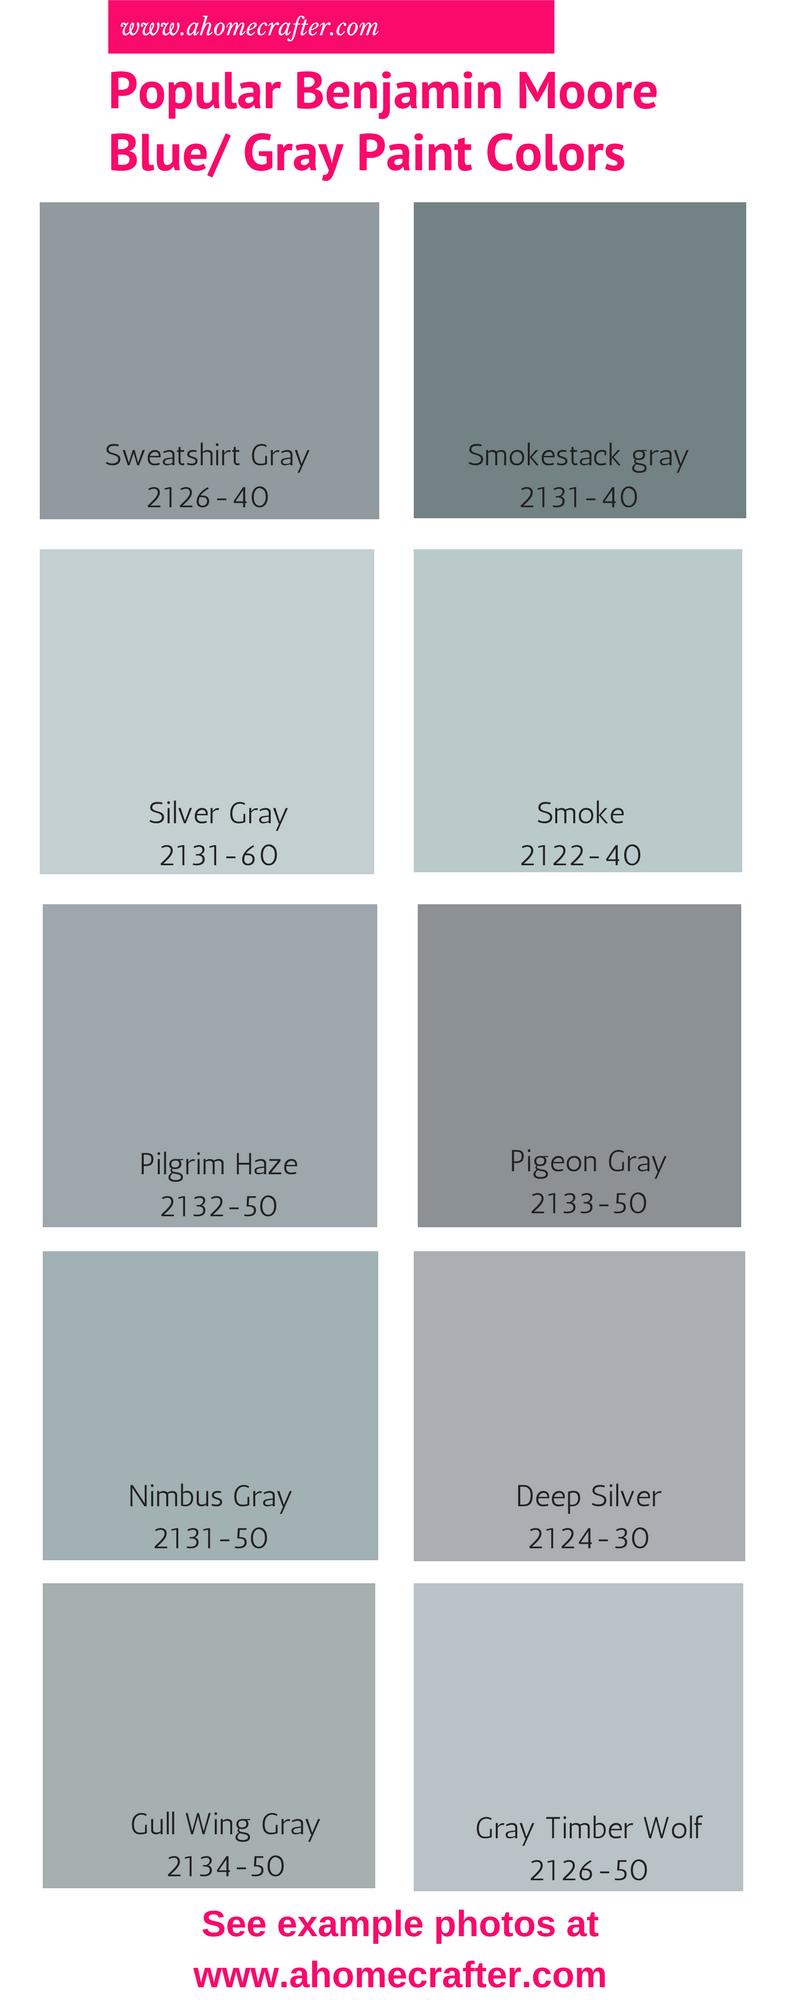 Home Decor Gray Blue Paint Colors Gray Blue Paint Colors Ideas With Enchanting For Living Room 2018 Blue Gray Paint Colors Blue Gray Paint Grey Paint Colors